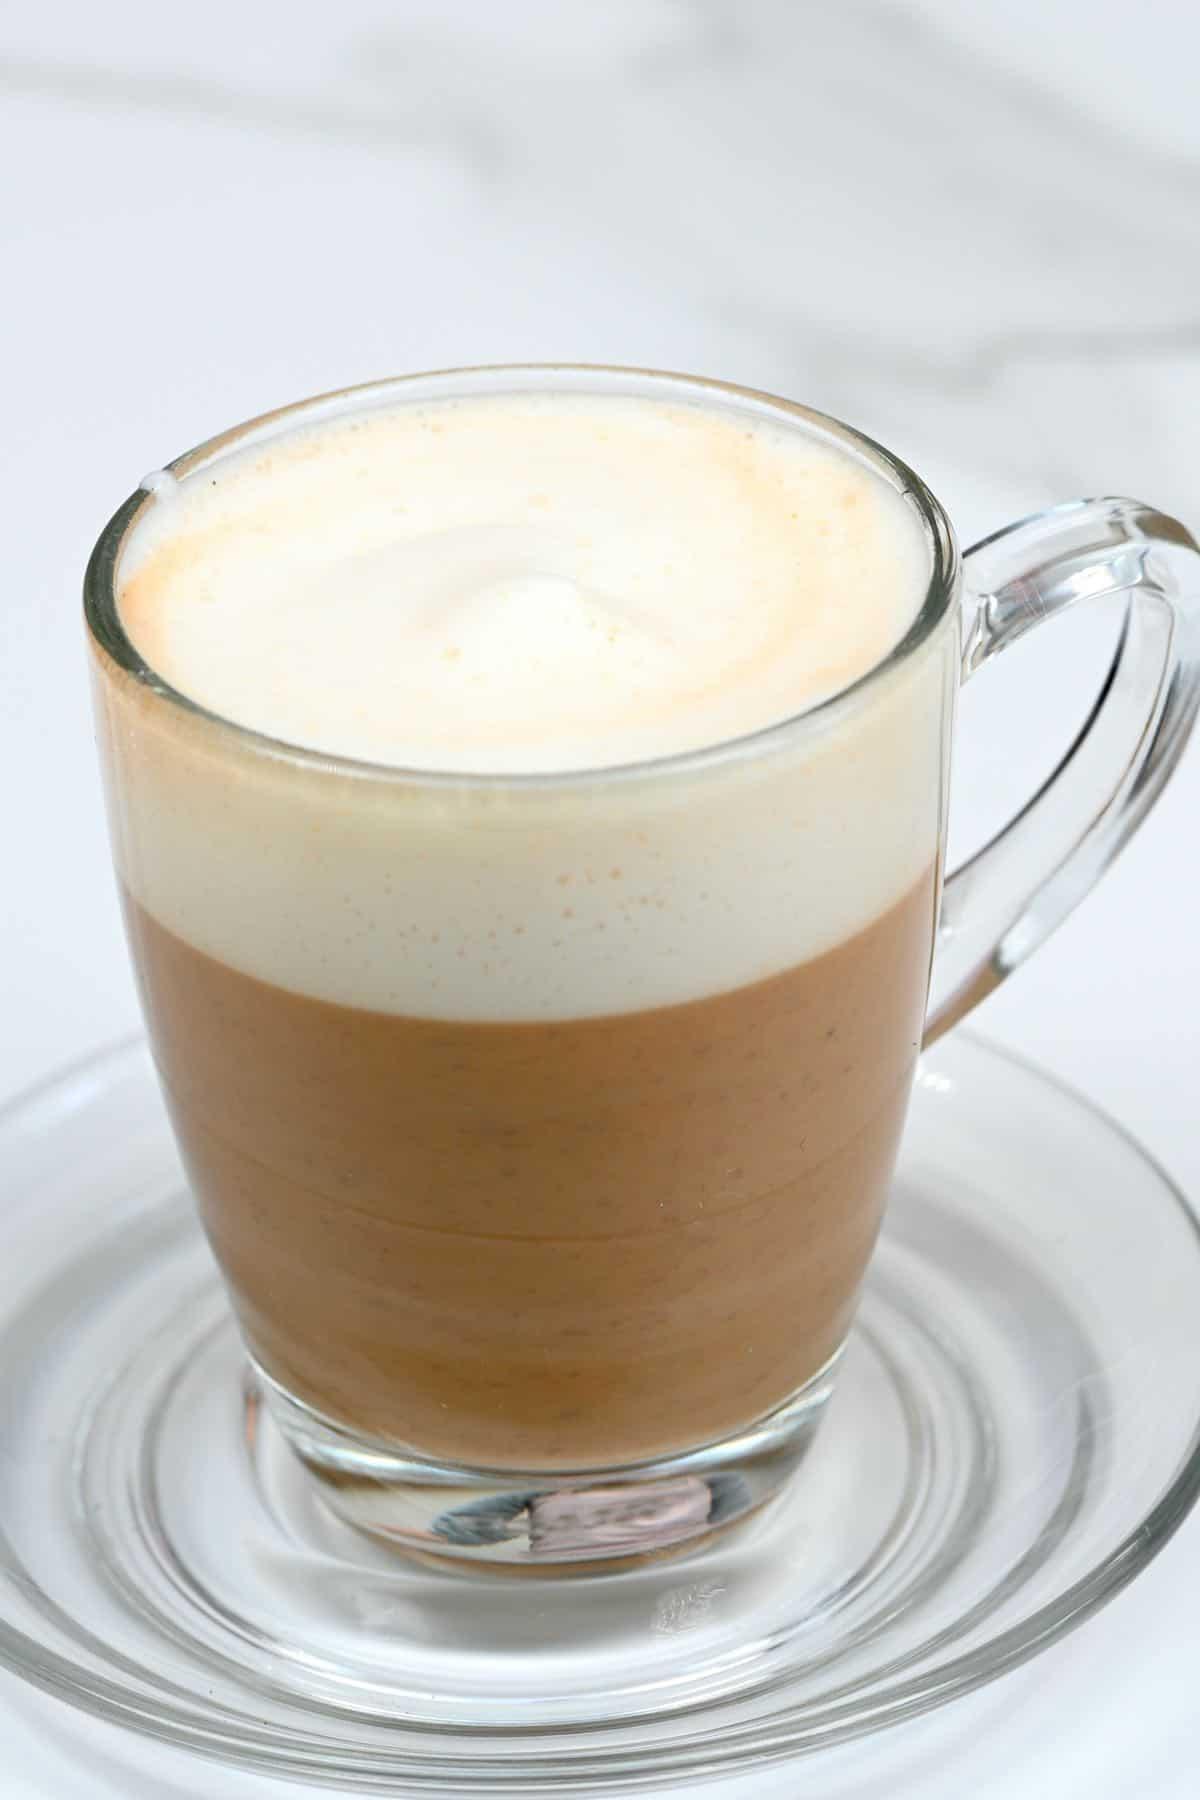 Mushroom latte in a cup